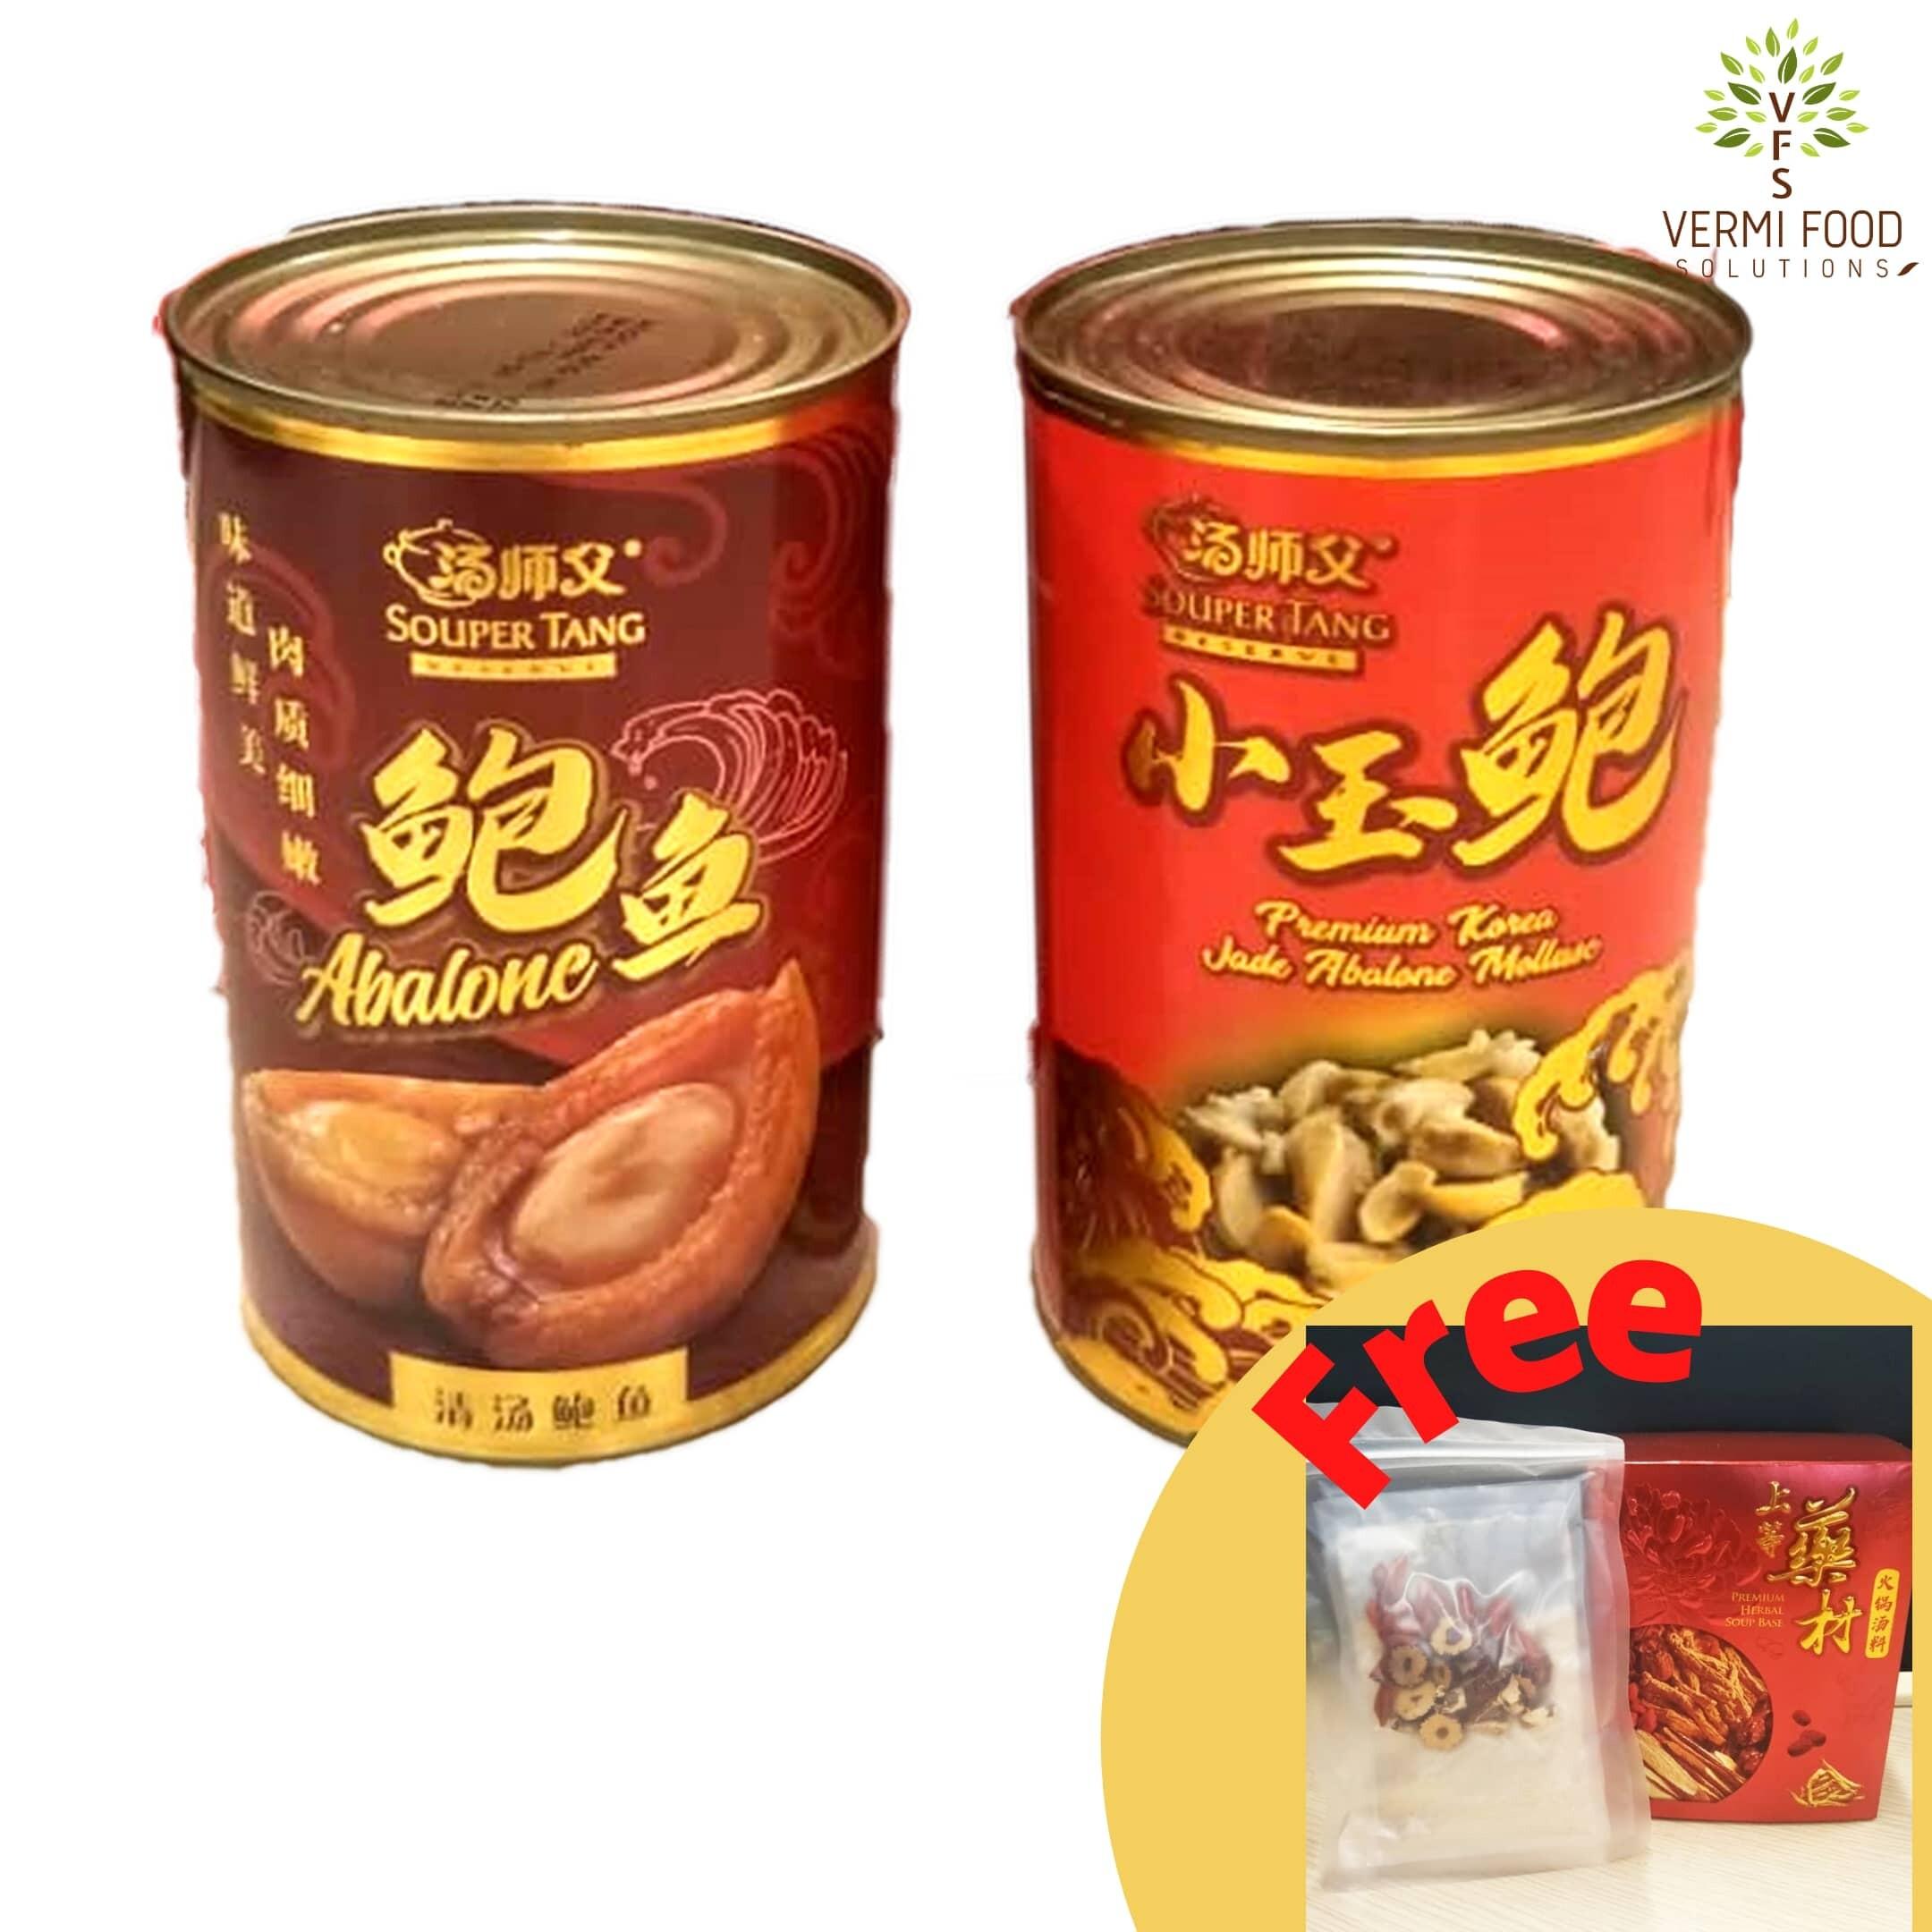 Souper Tang Reserve Abalone + Premium Korea Jade Abalone (汤师父 清汤鲍鱼+小玉鲍) 425g x 2 Tin ?Buy 1 set Free 1? Herbal Soup Base